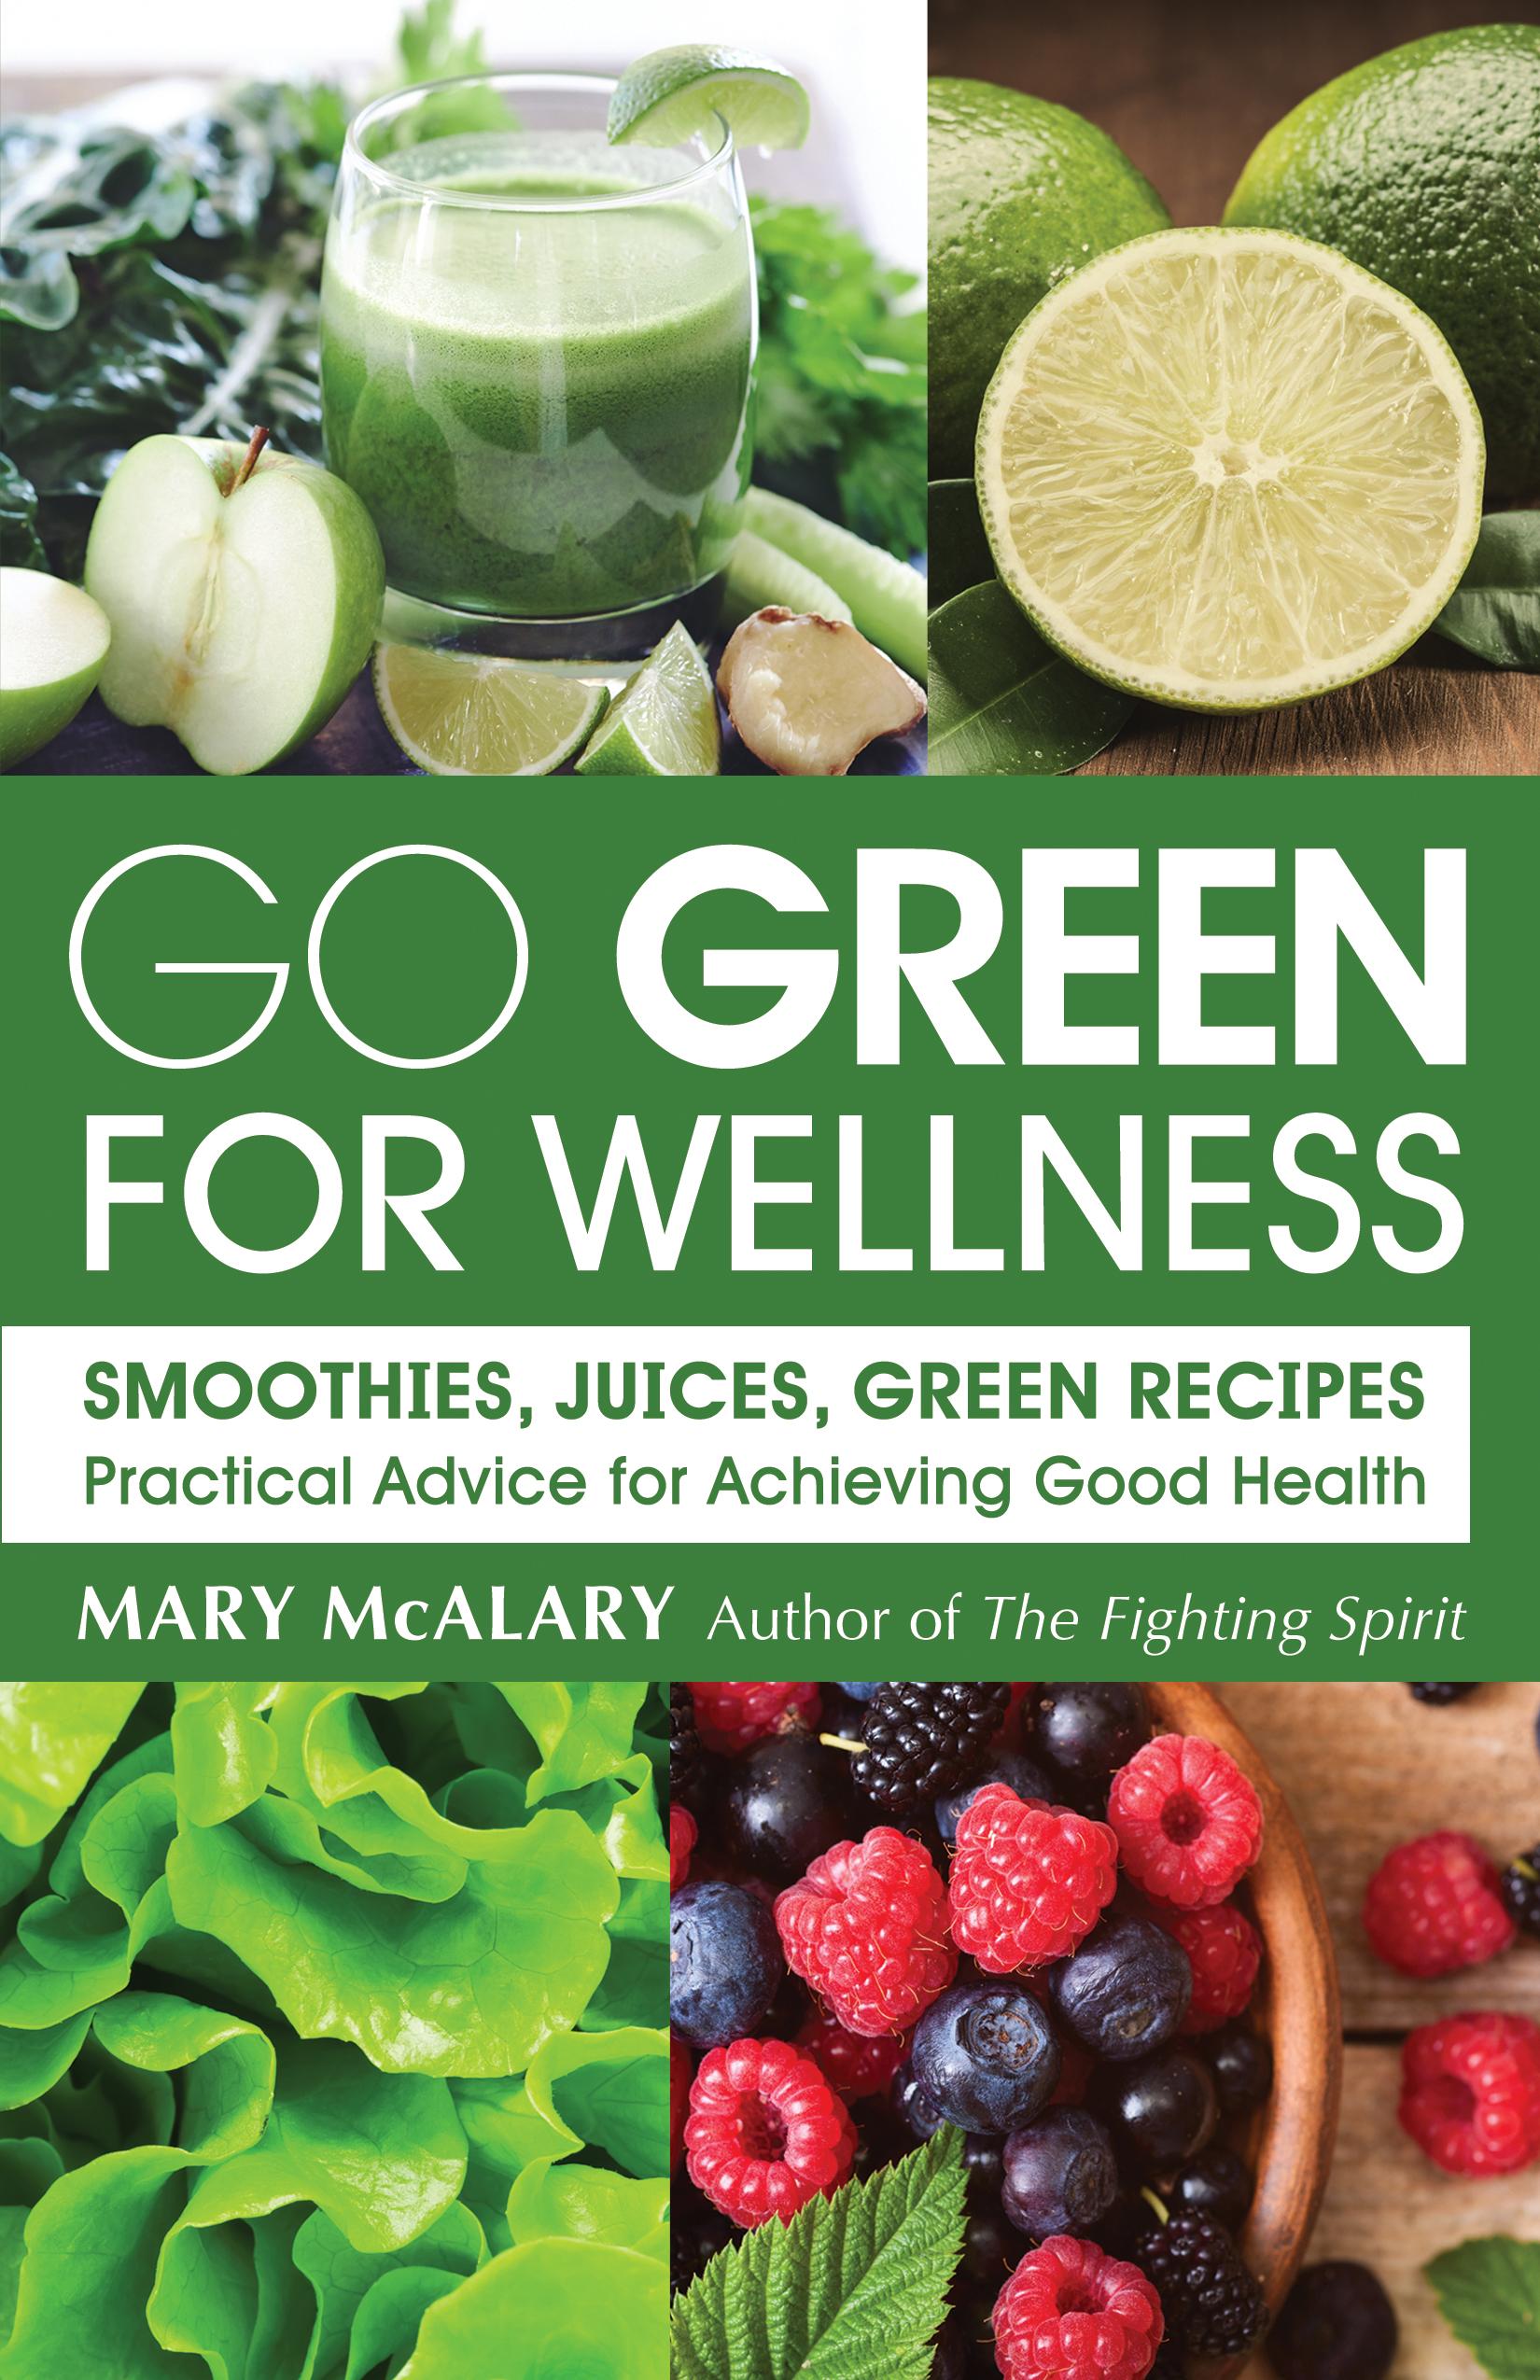 Go Green For Wellness Front Cover.jpg